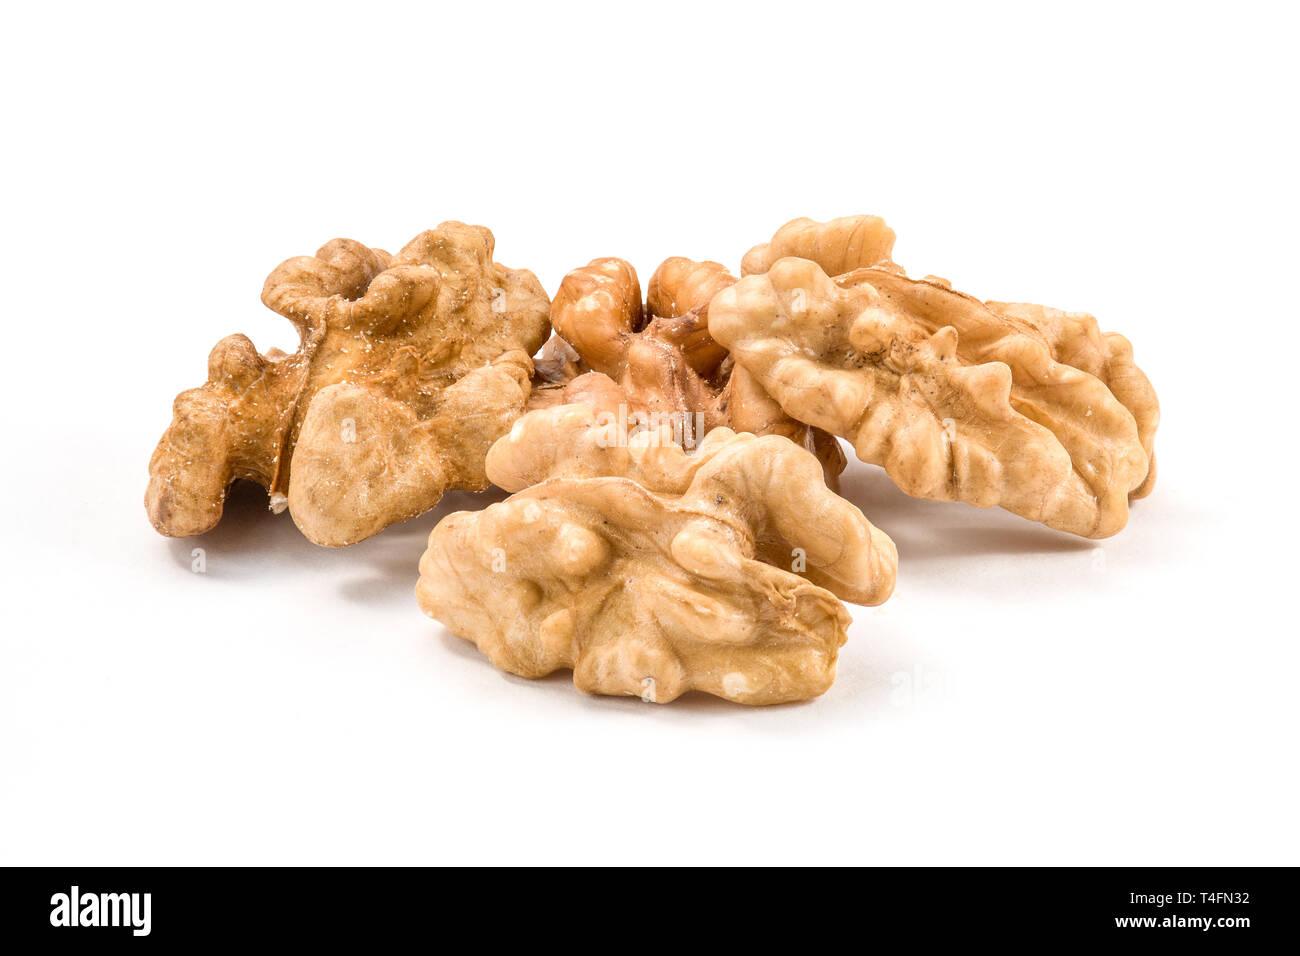 Natural walnut core macro close-up isolated - Stock Image